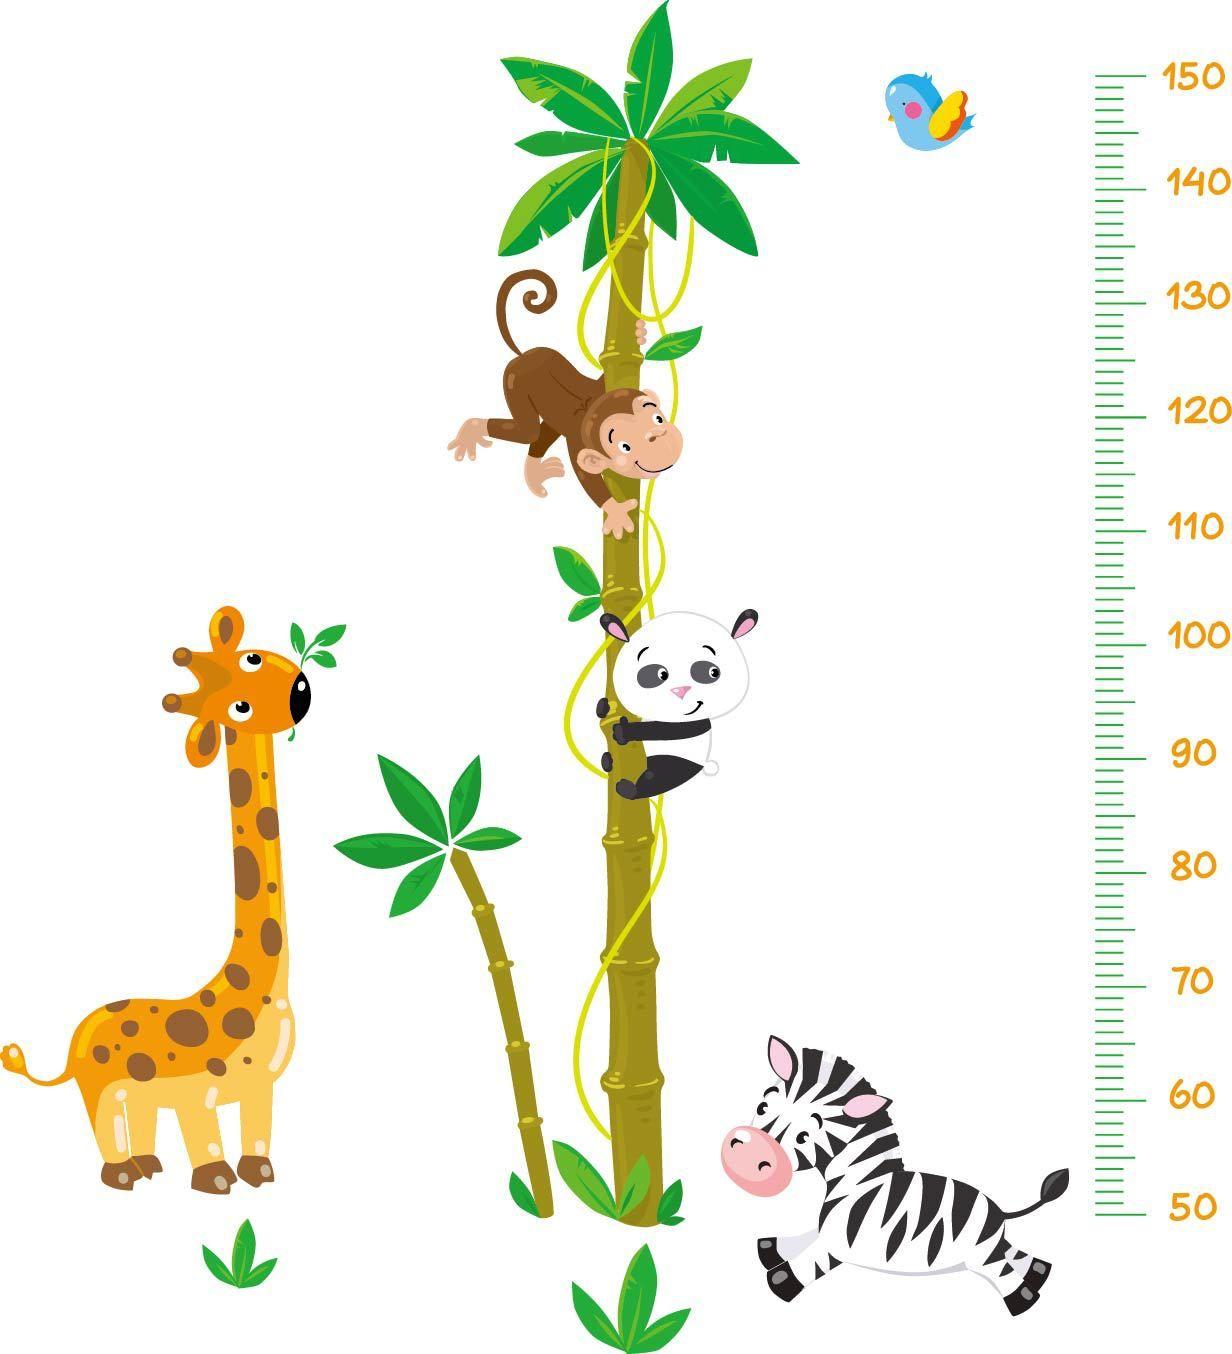 Muursticker Jungle Groeimeter - Muurstickers Babykamer & Kinderkamer